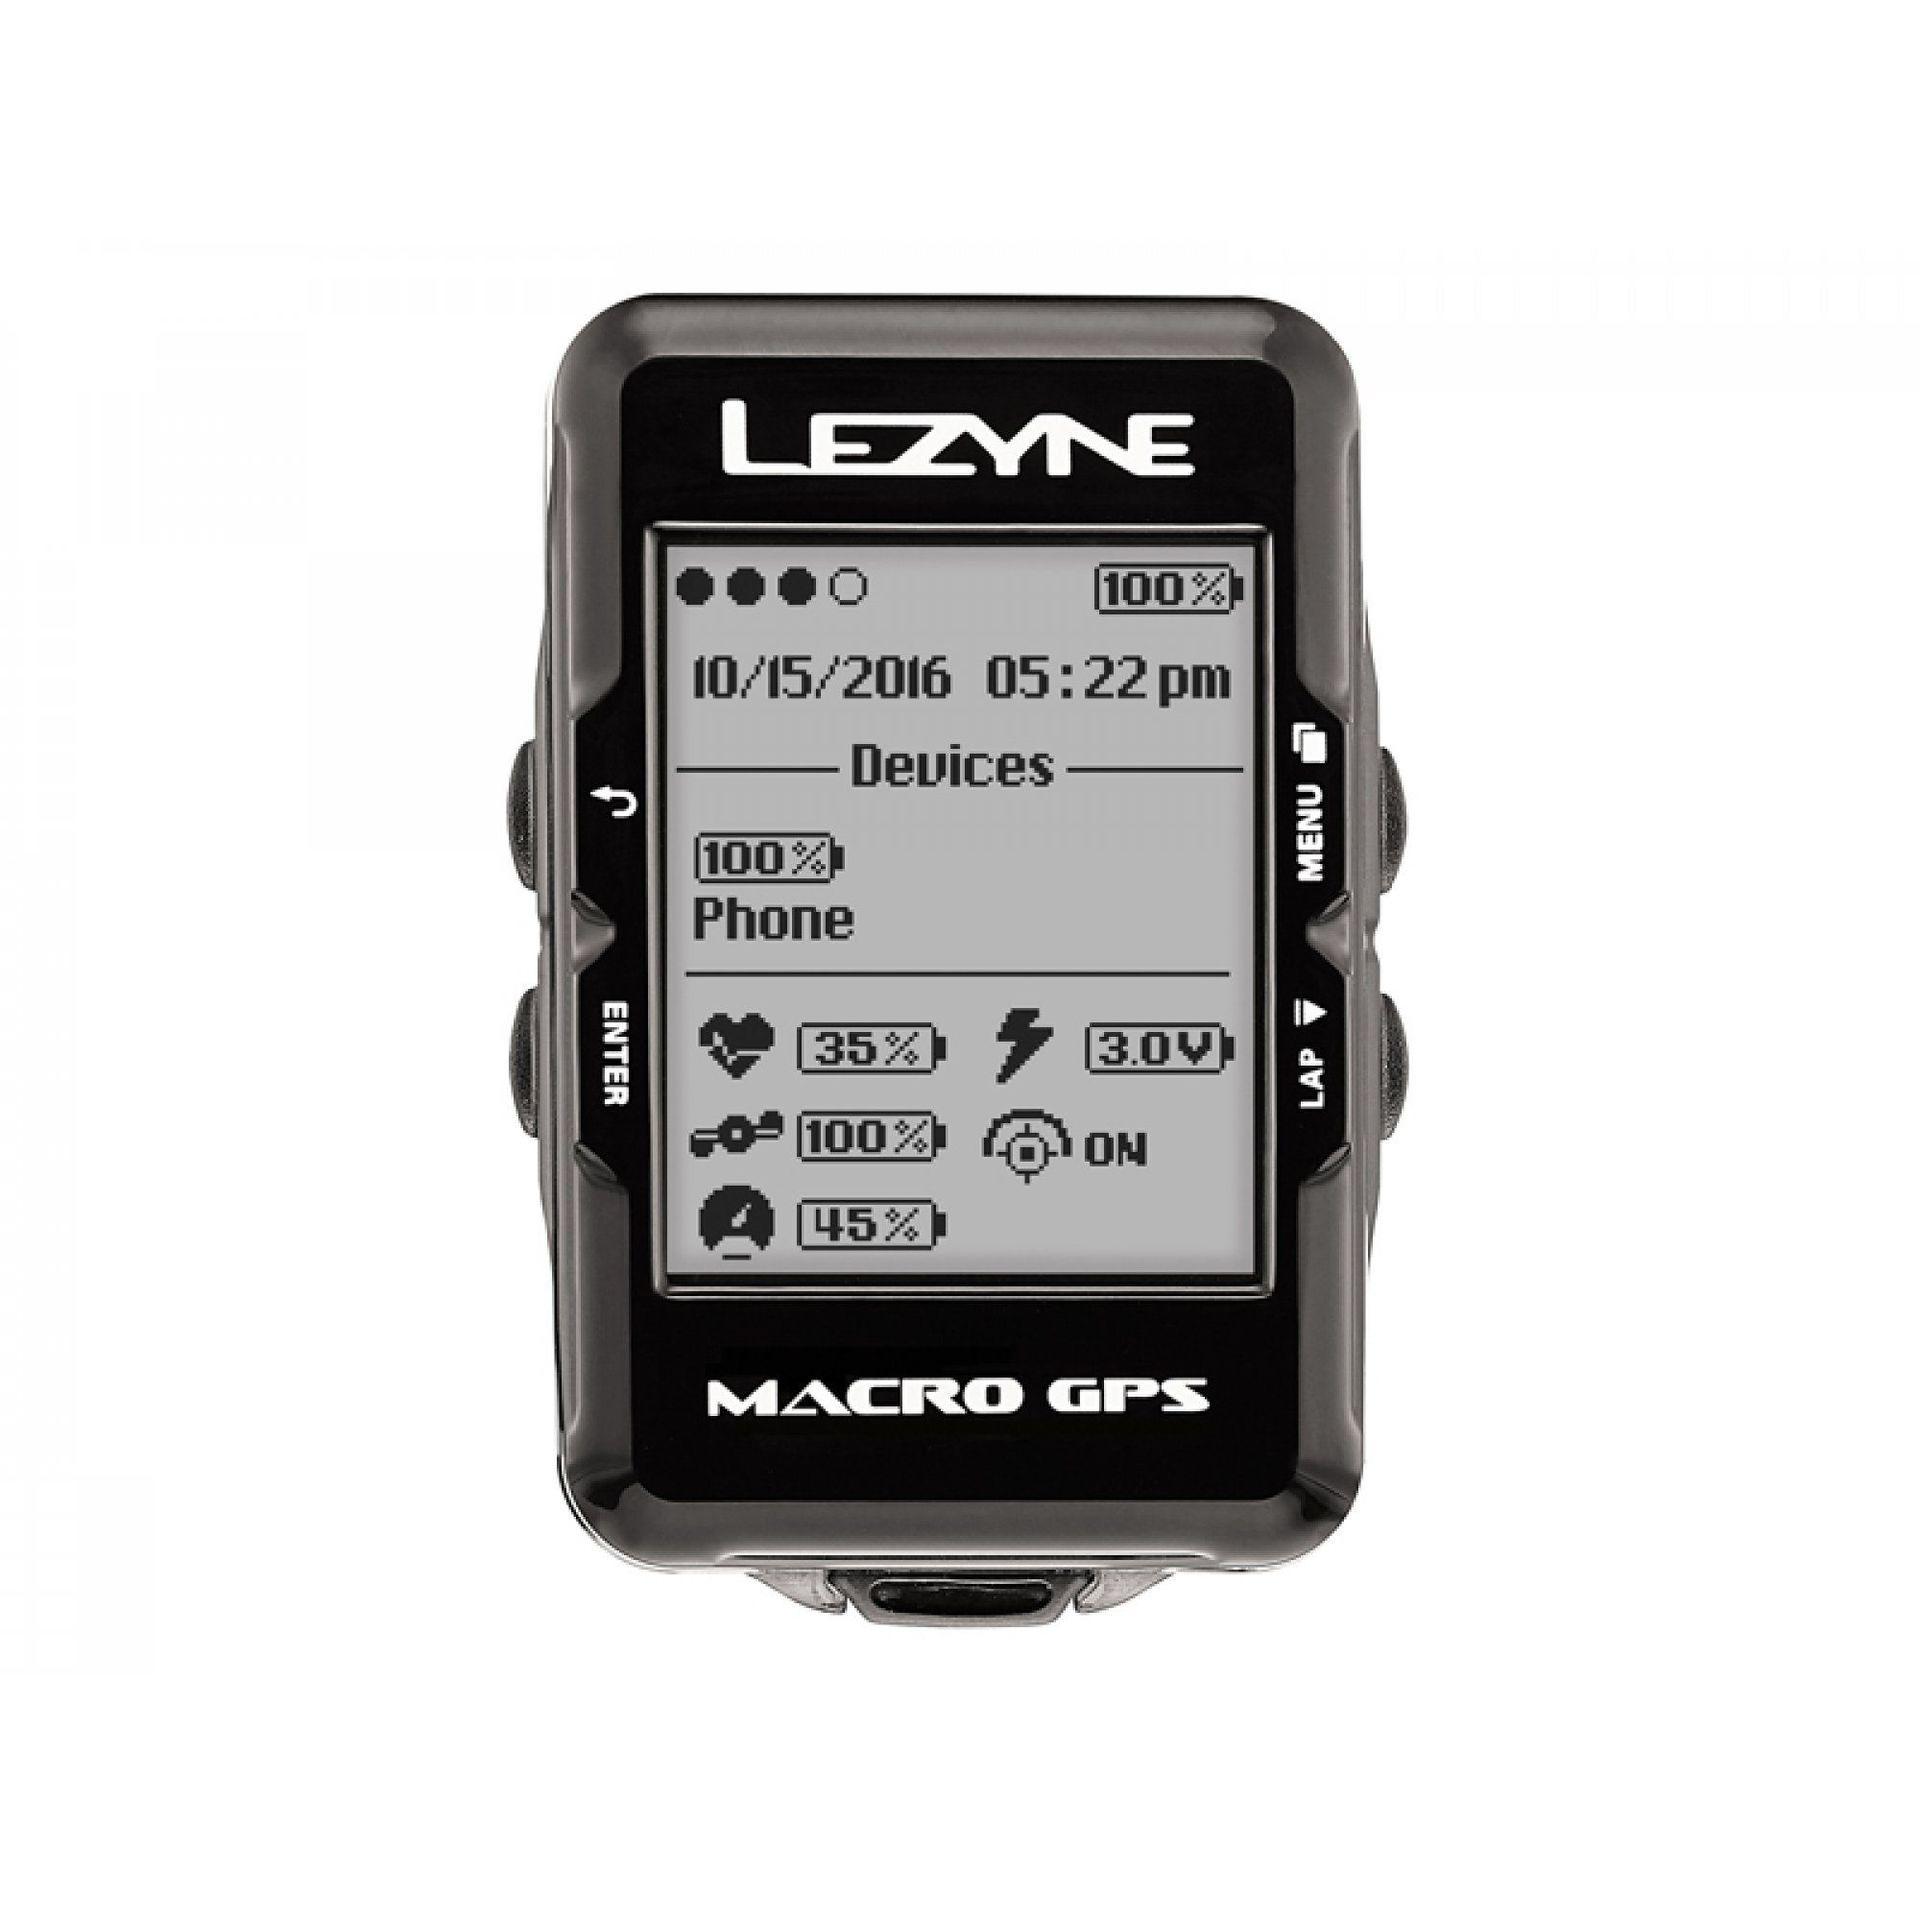 KOMPUTER ROWEROWY LEZYNE MACRO GPS CZARNY 1